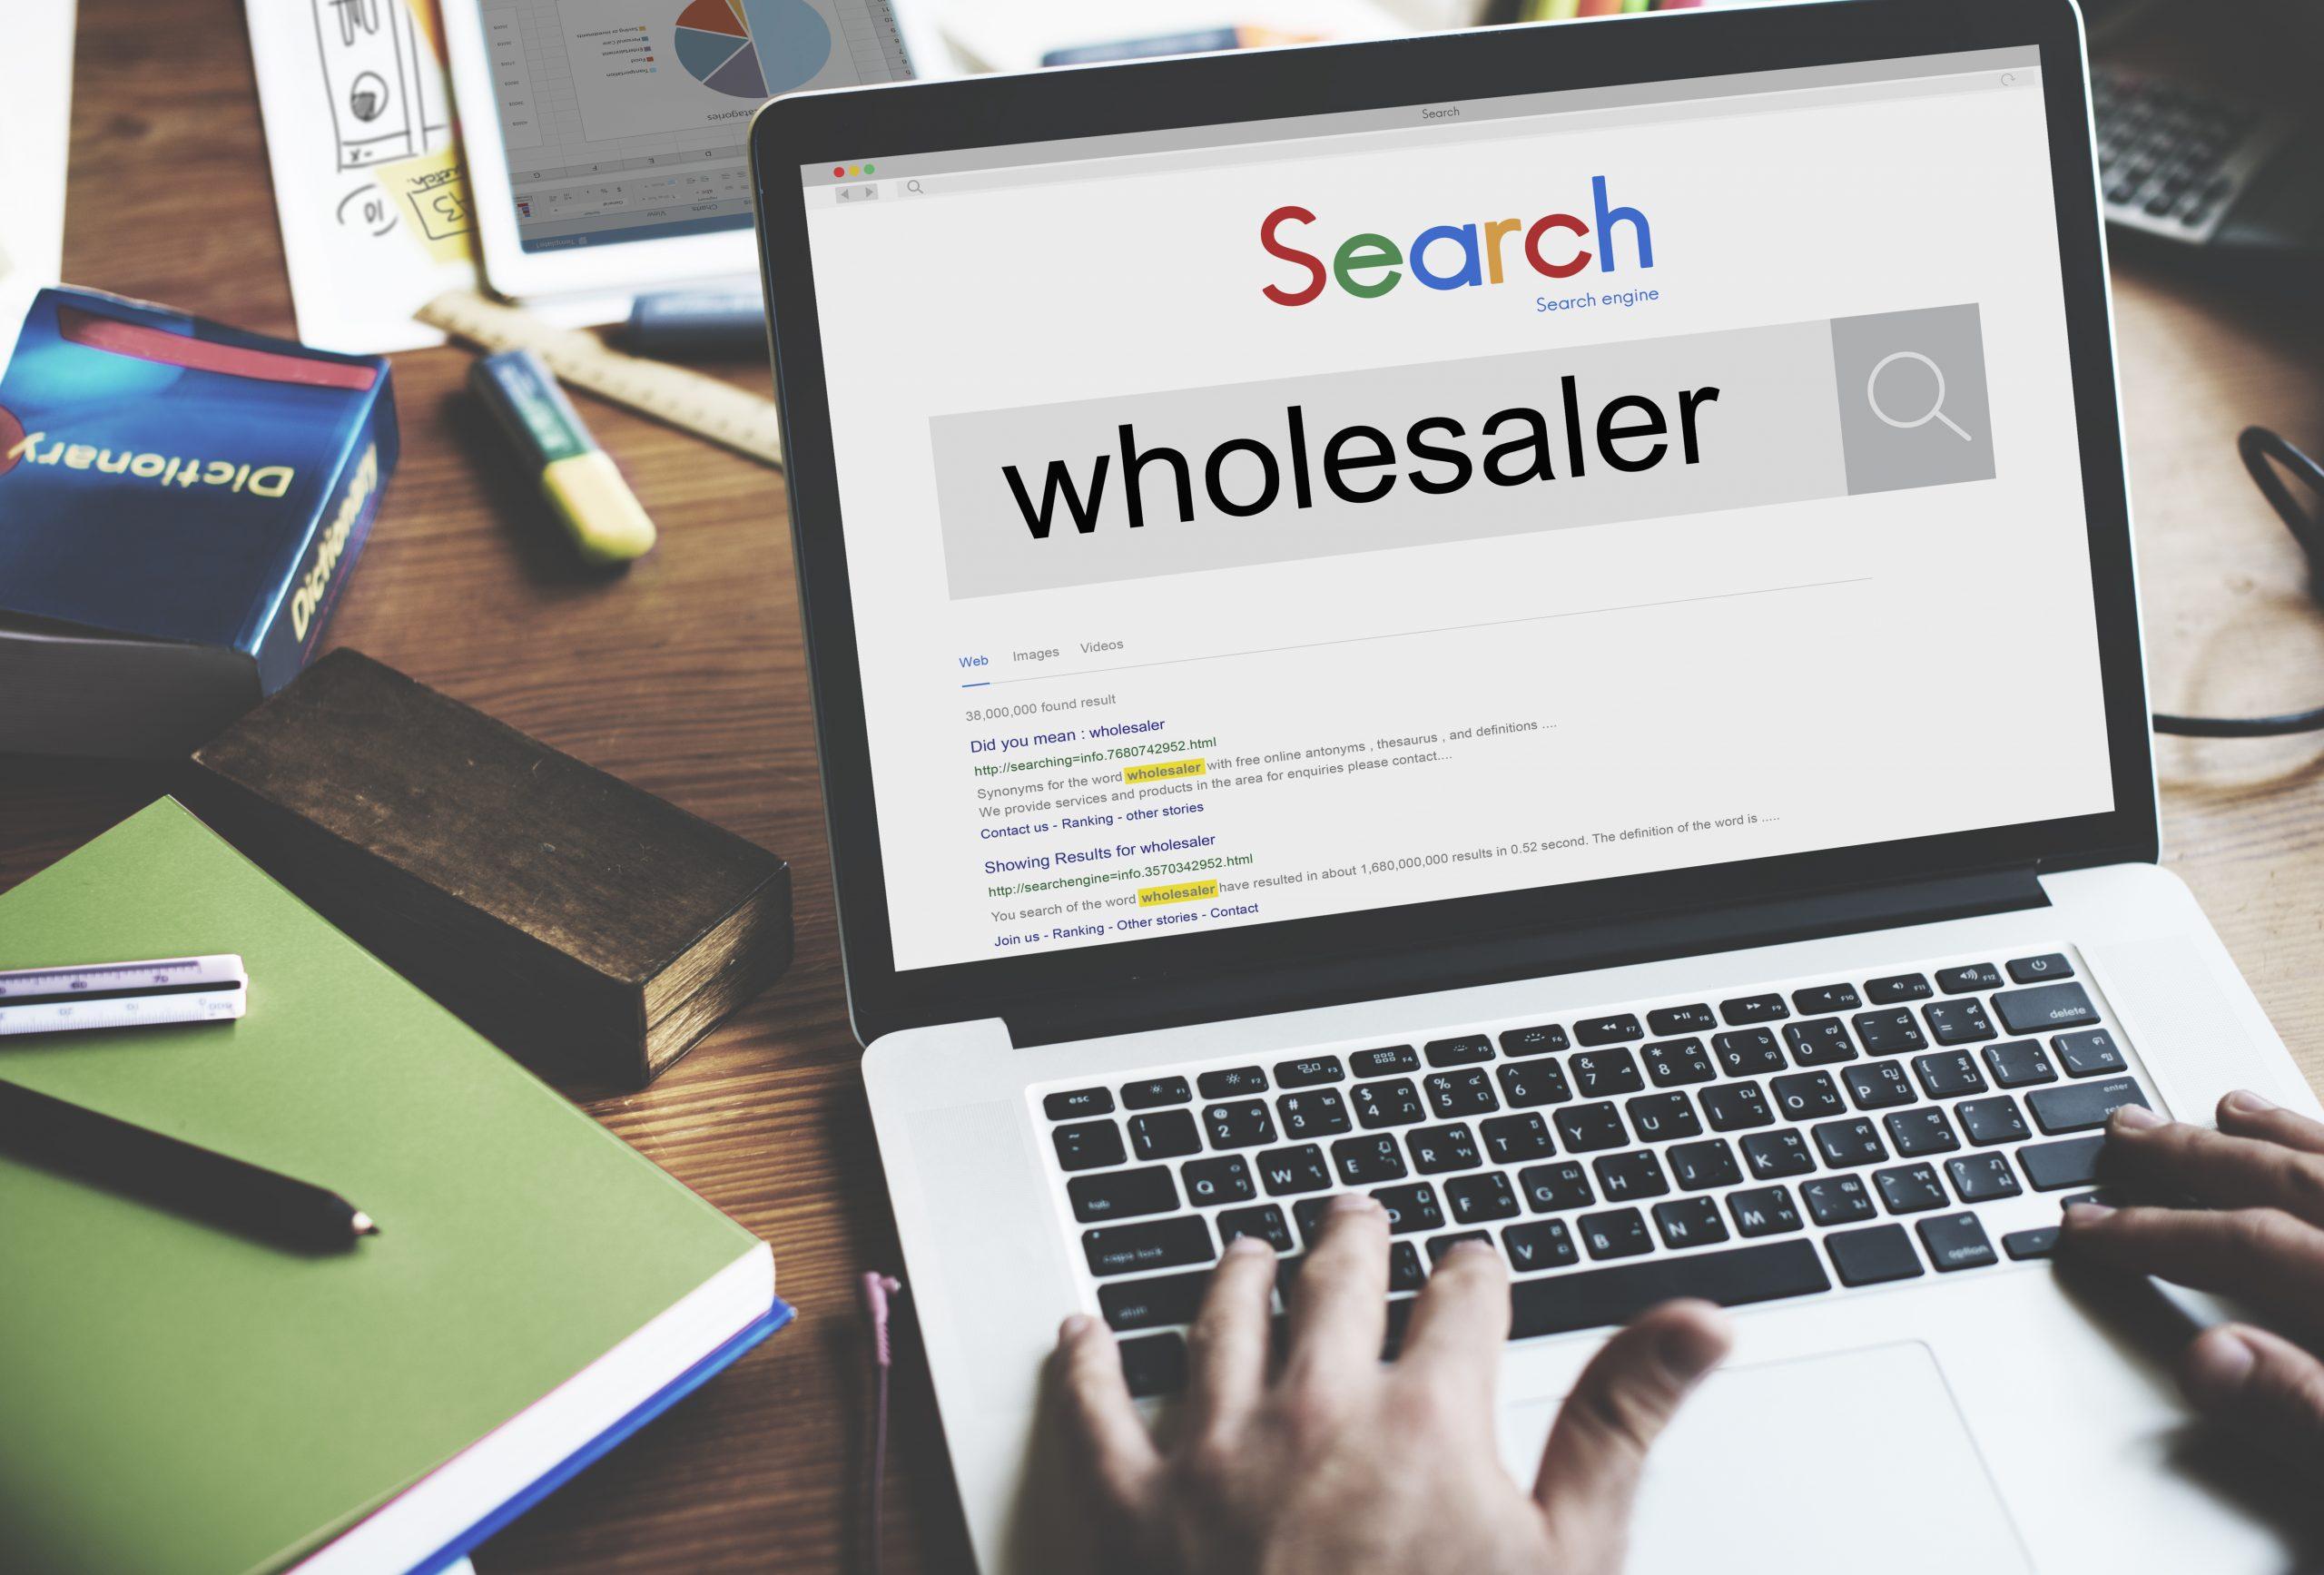 cosa sono i Wholesaler?